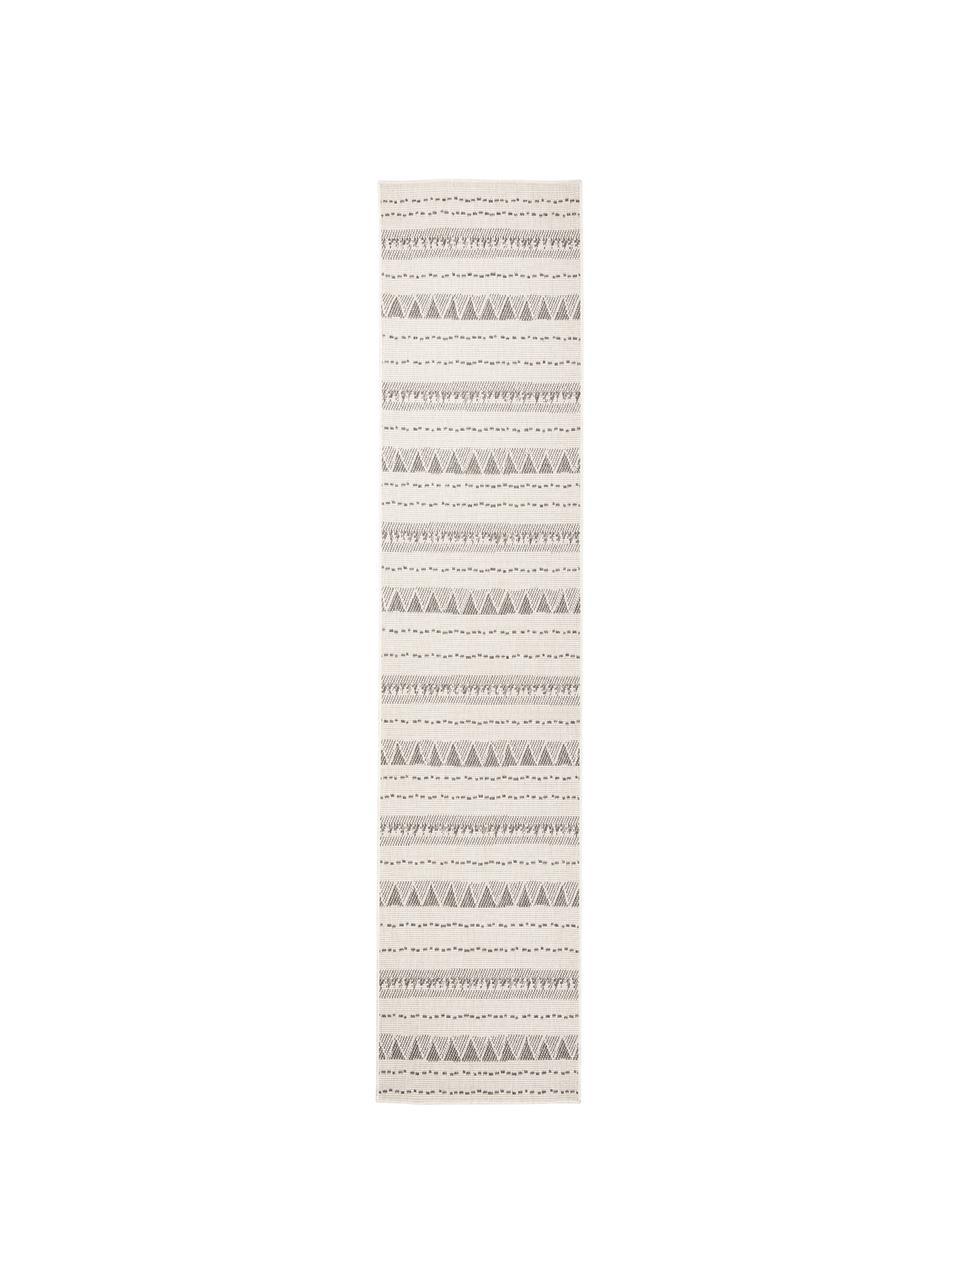 In- & Outdoor-Wendeläufer Bahamas in Grau/Creme, 100% Polypropylen, Grau, Cremefarben, 80 x 350 cm